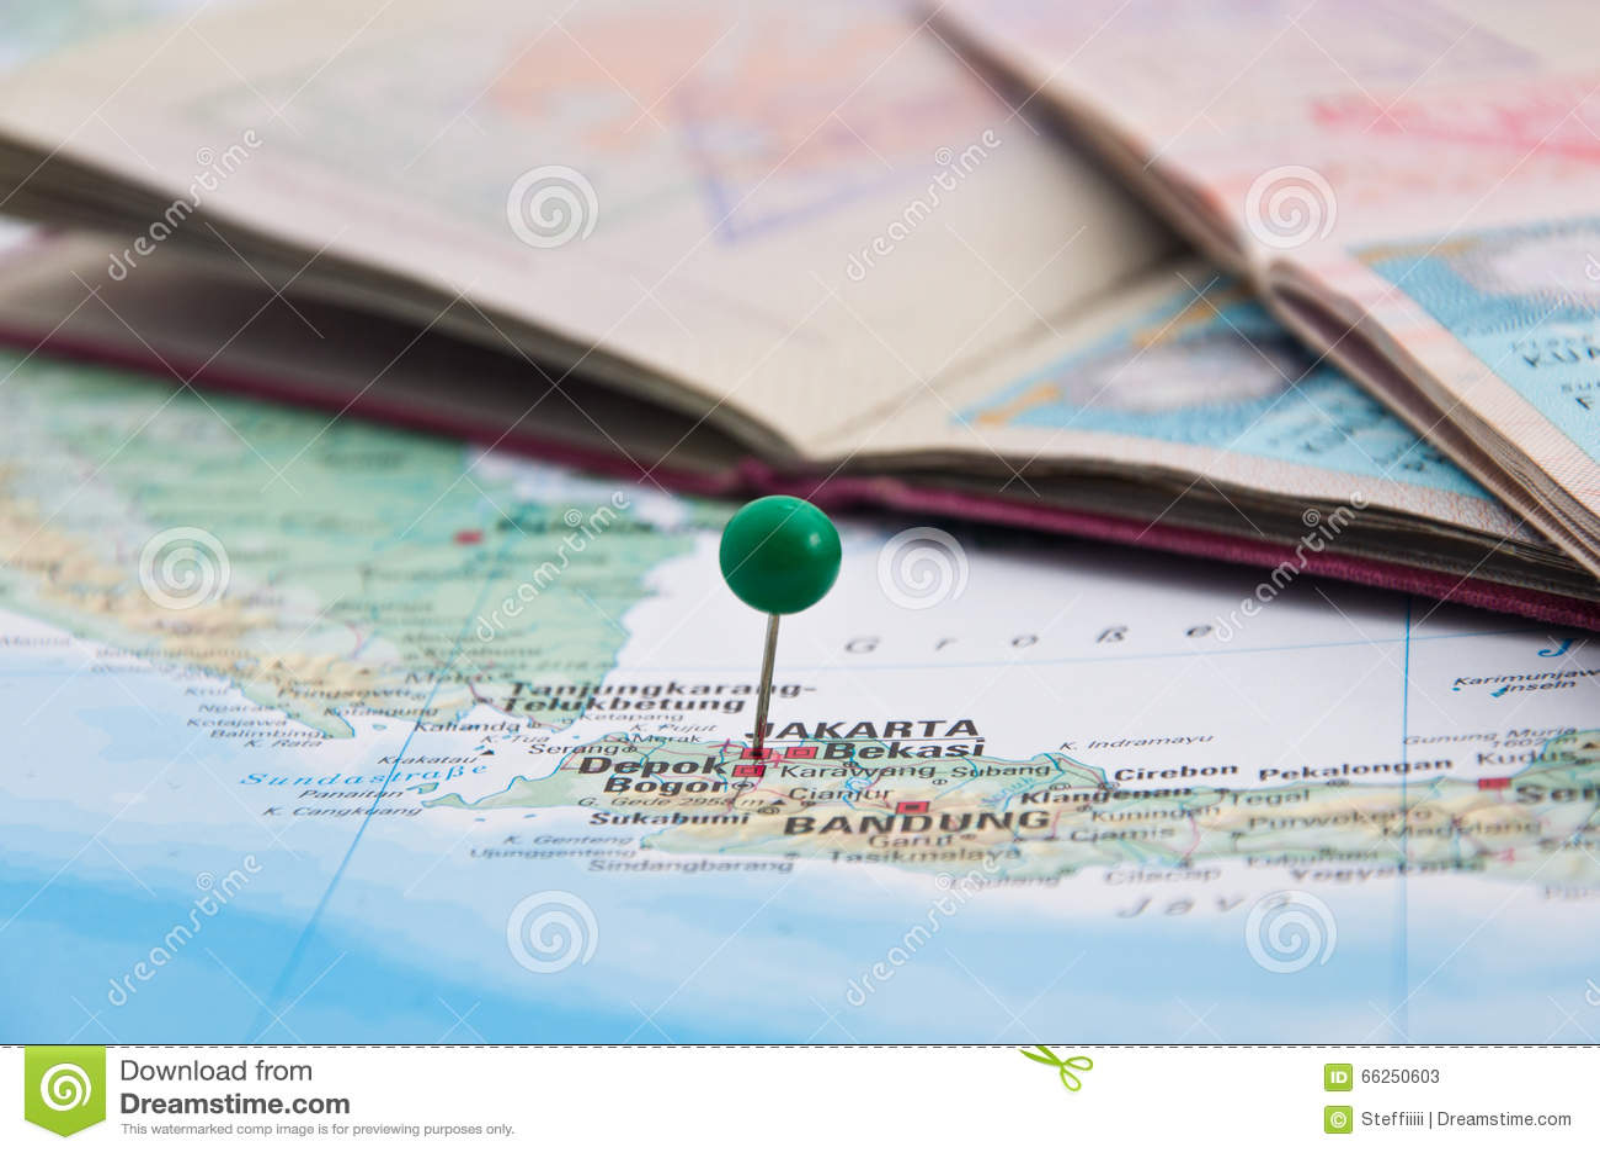 Jakarta, Java, Indonesia, GreenPin and Passport, Close-Up of Map